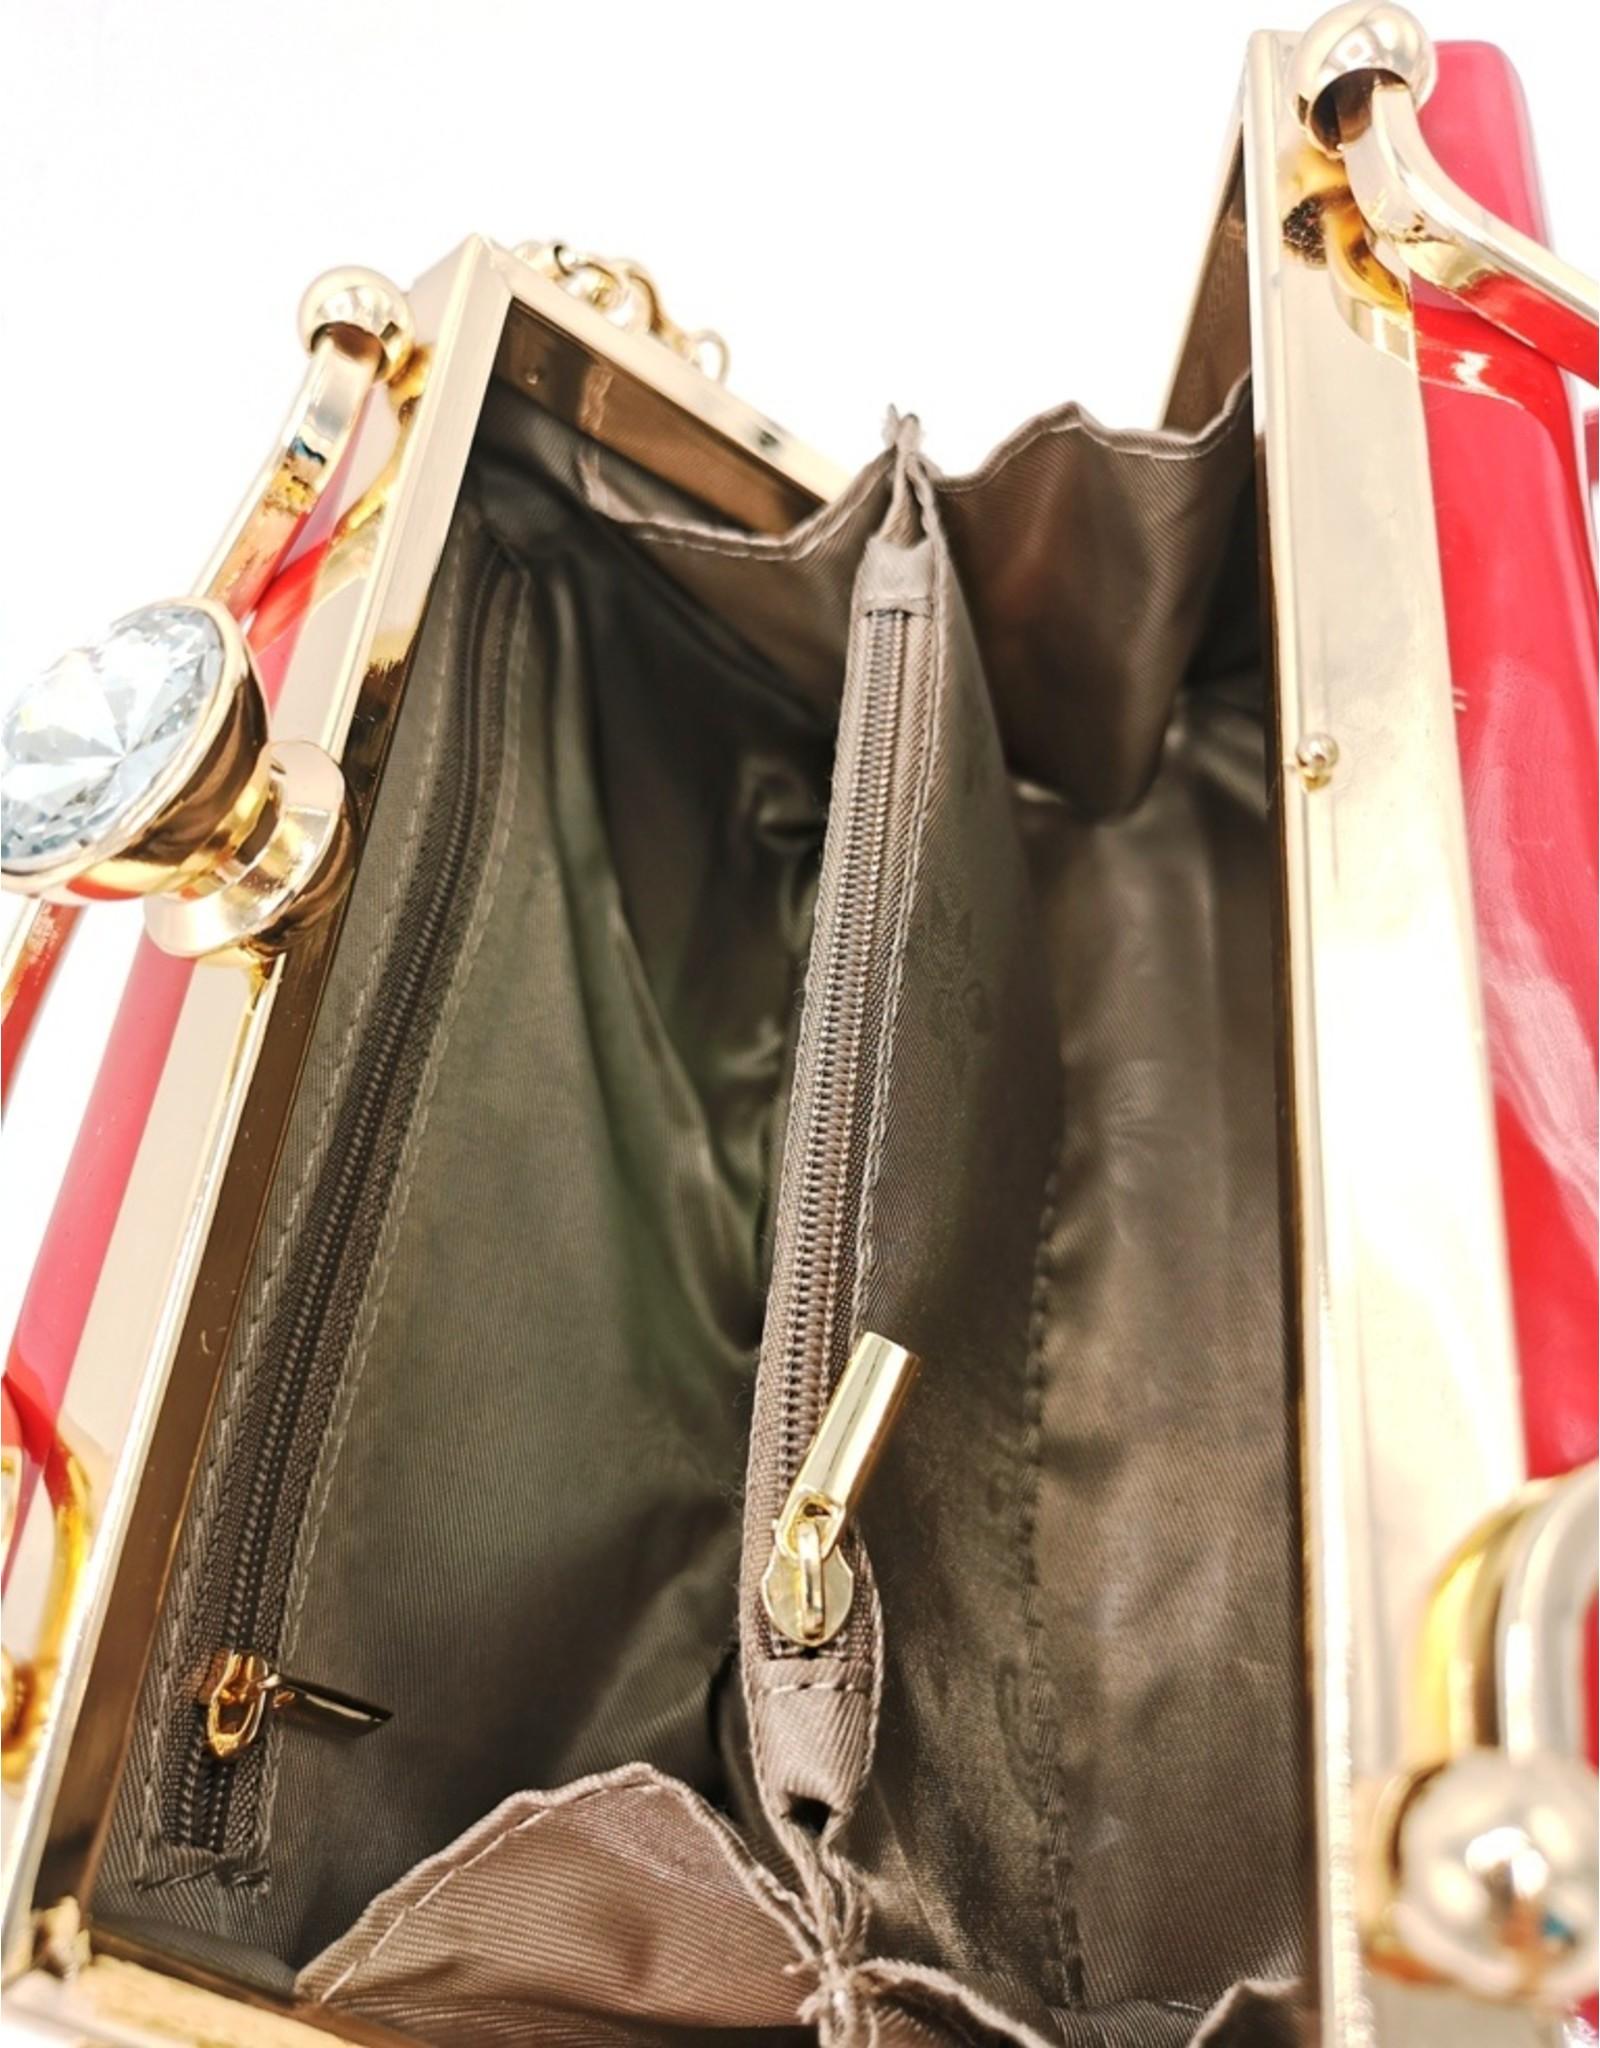 Valentina Retro bags  Vintage bags - Glamour Retro Lacquer handbag red